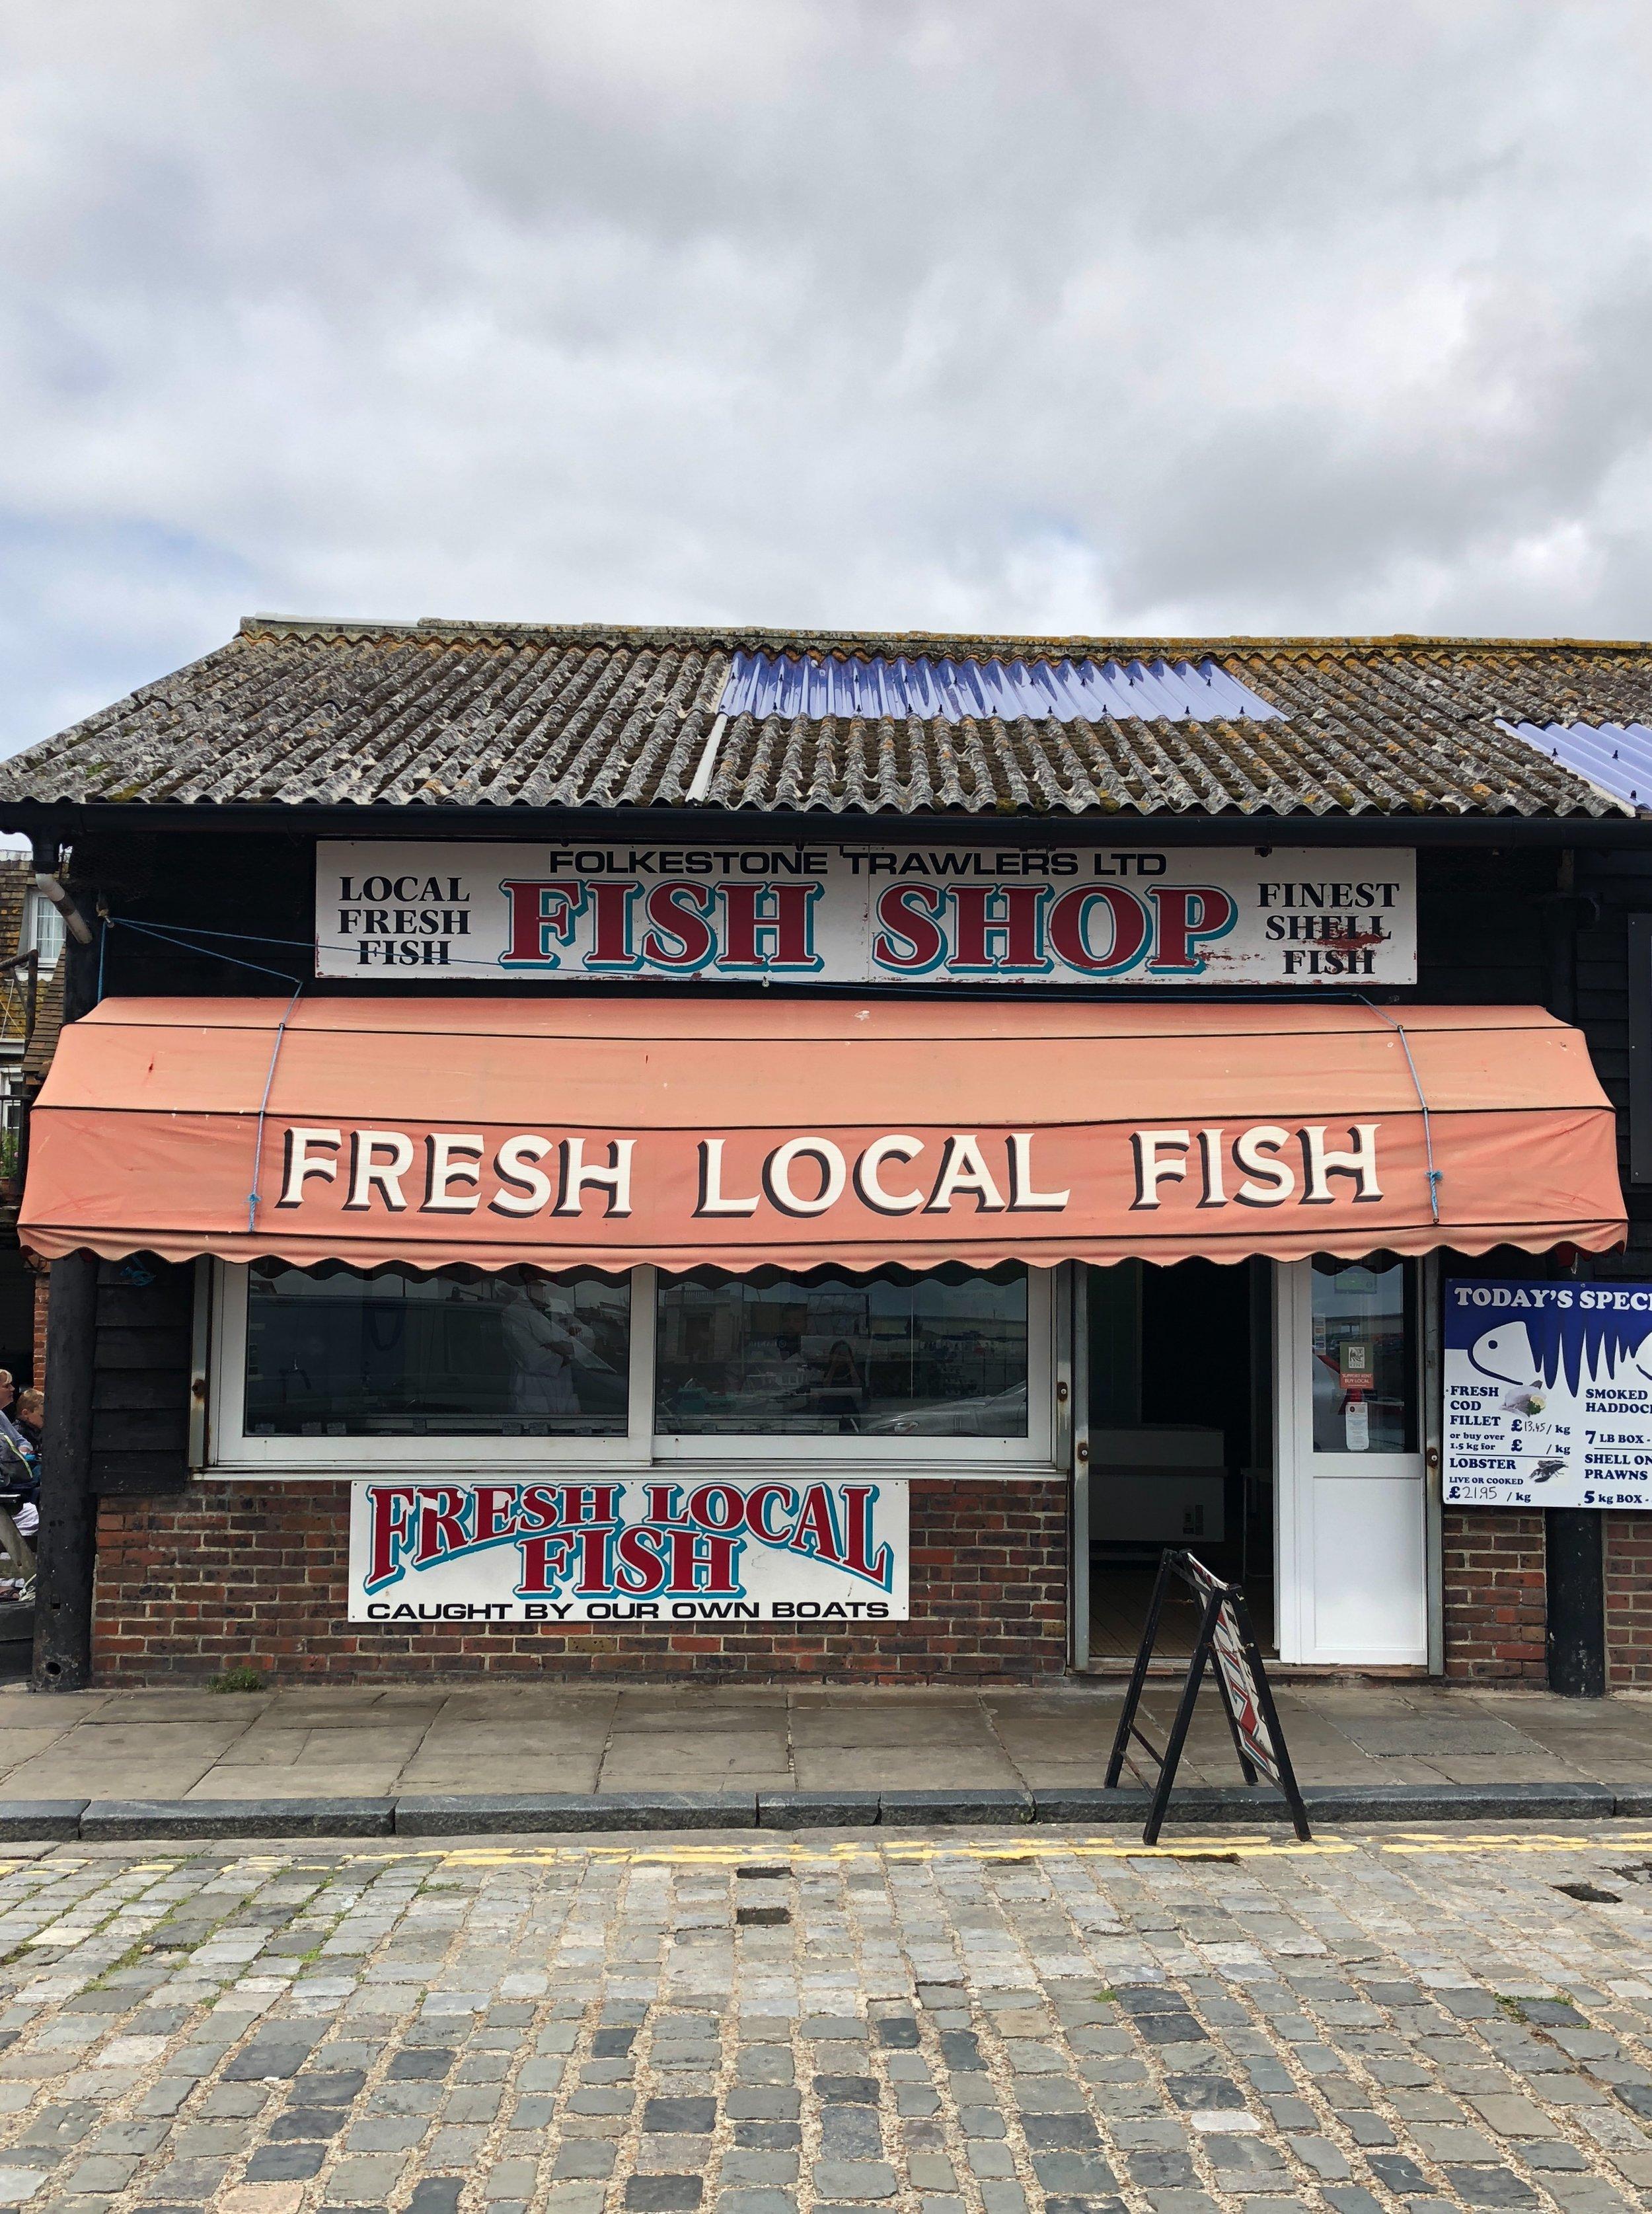 Fresh Local Fish, Folkestone by Clementine May.JPG